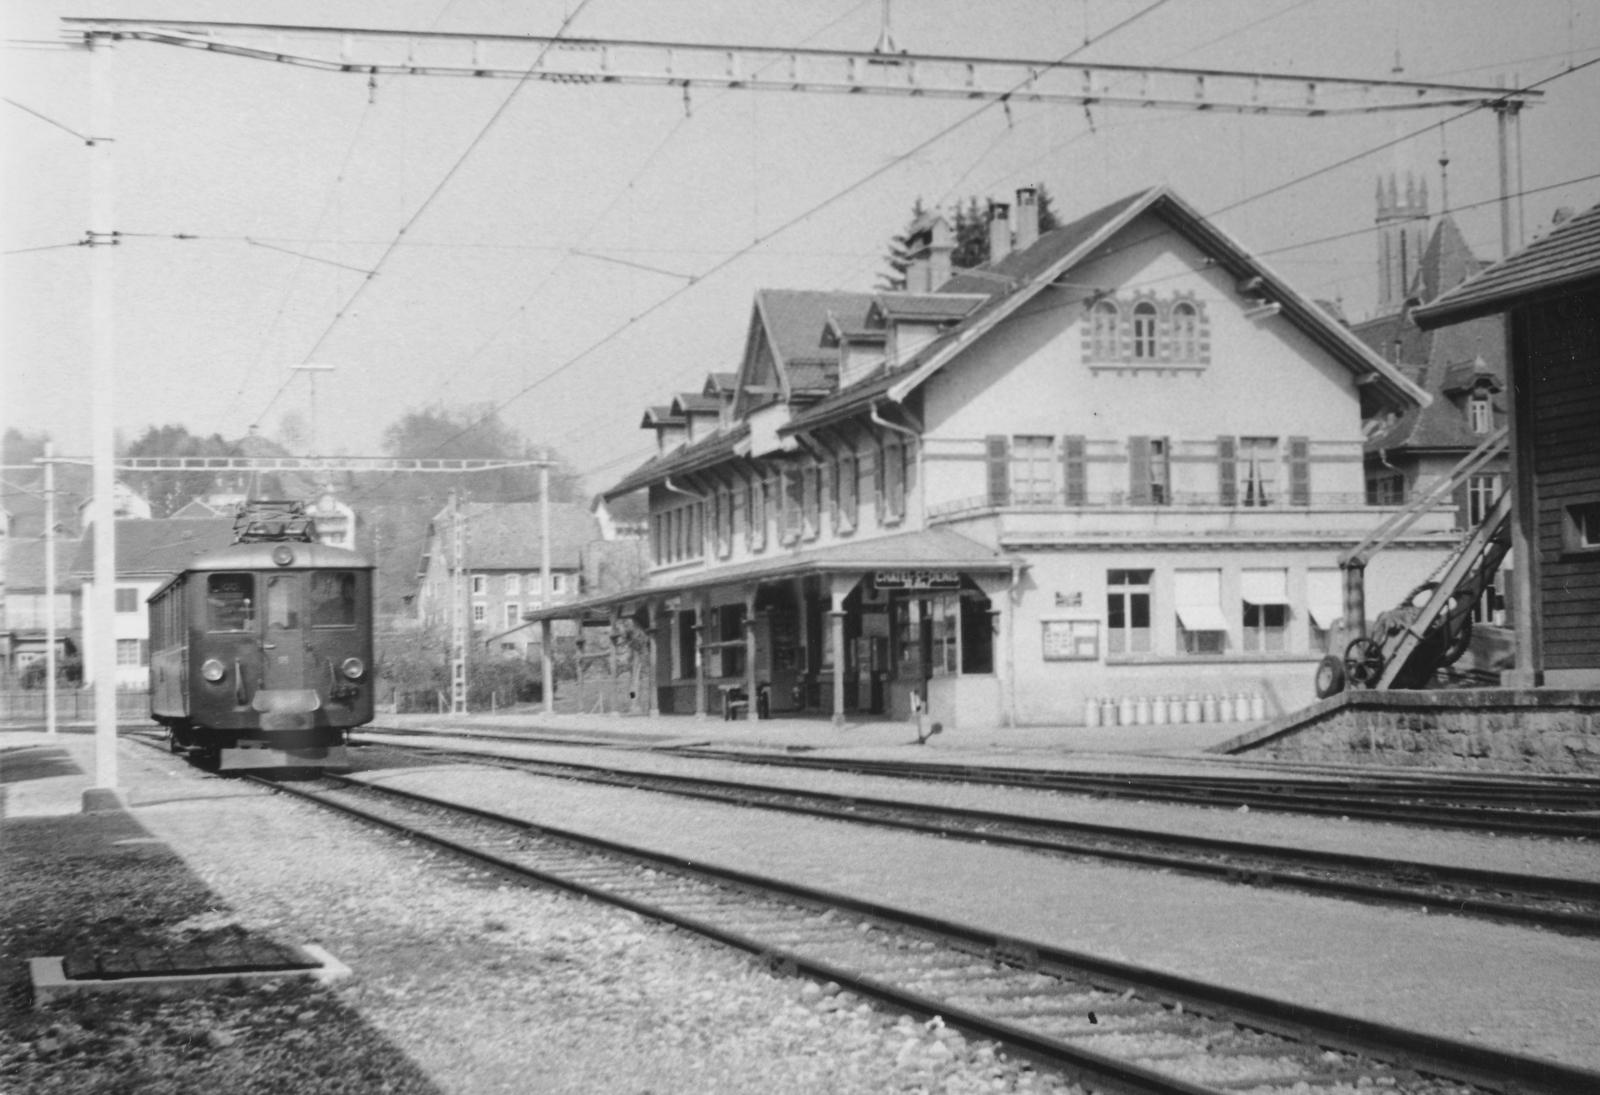 Châtel-St-Denis - Gare/Bahnhof Châtel-St-Denis